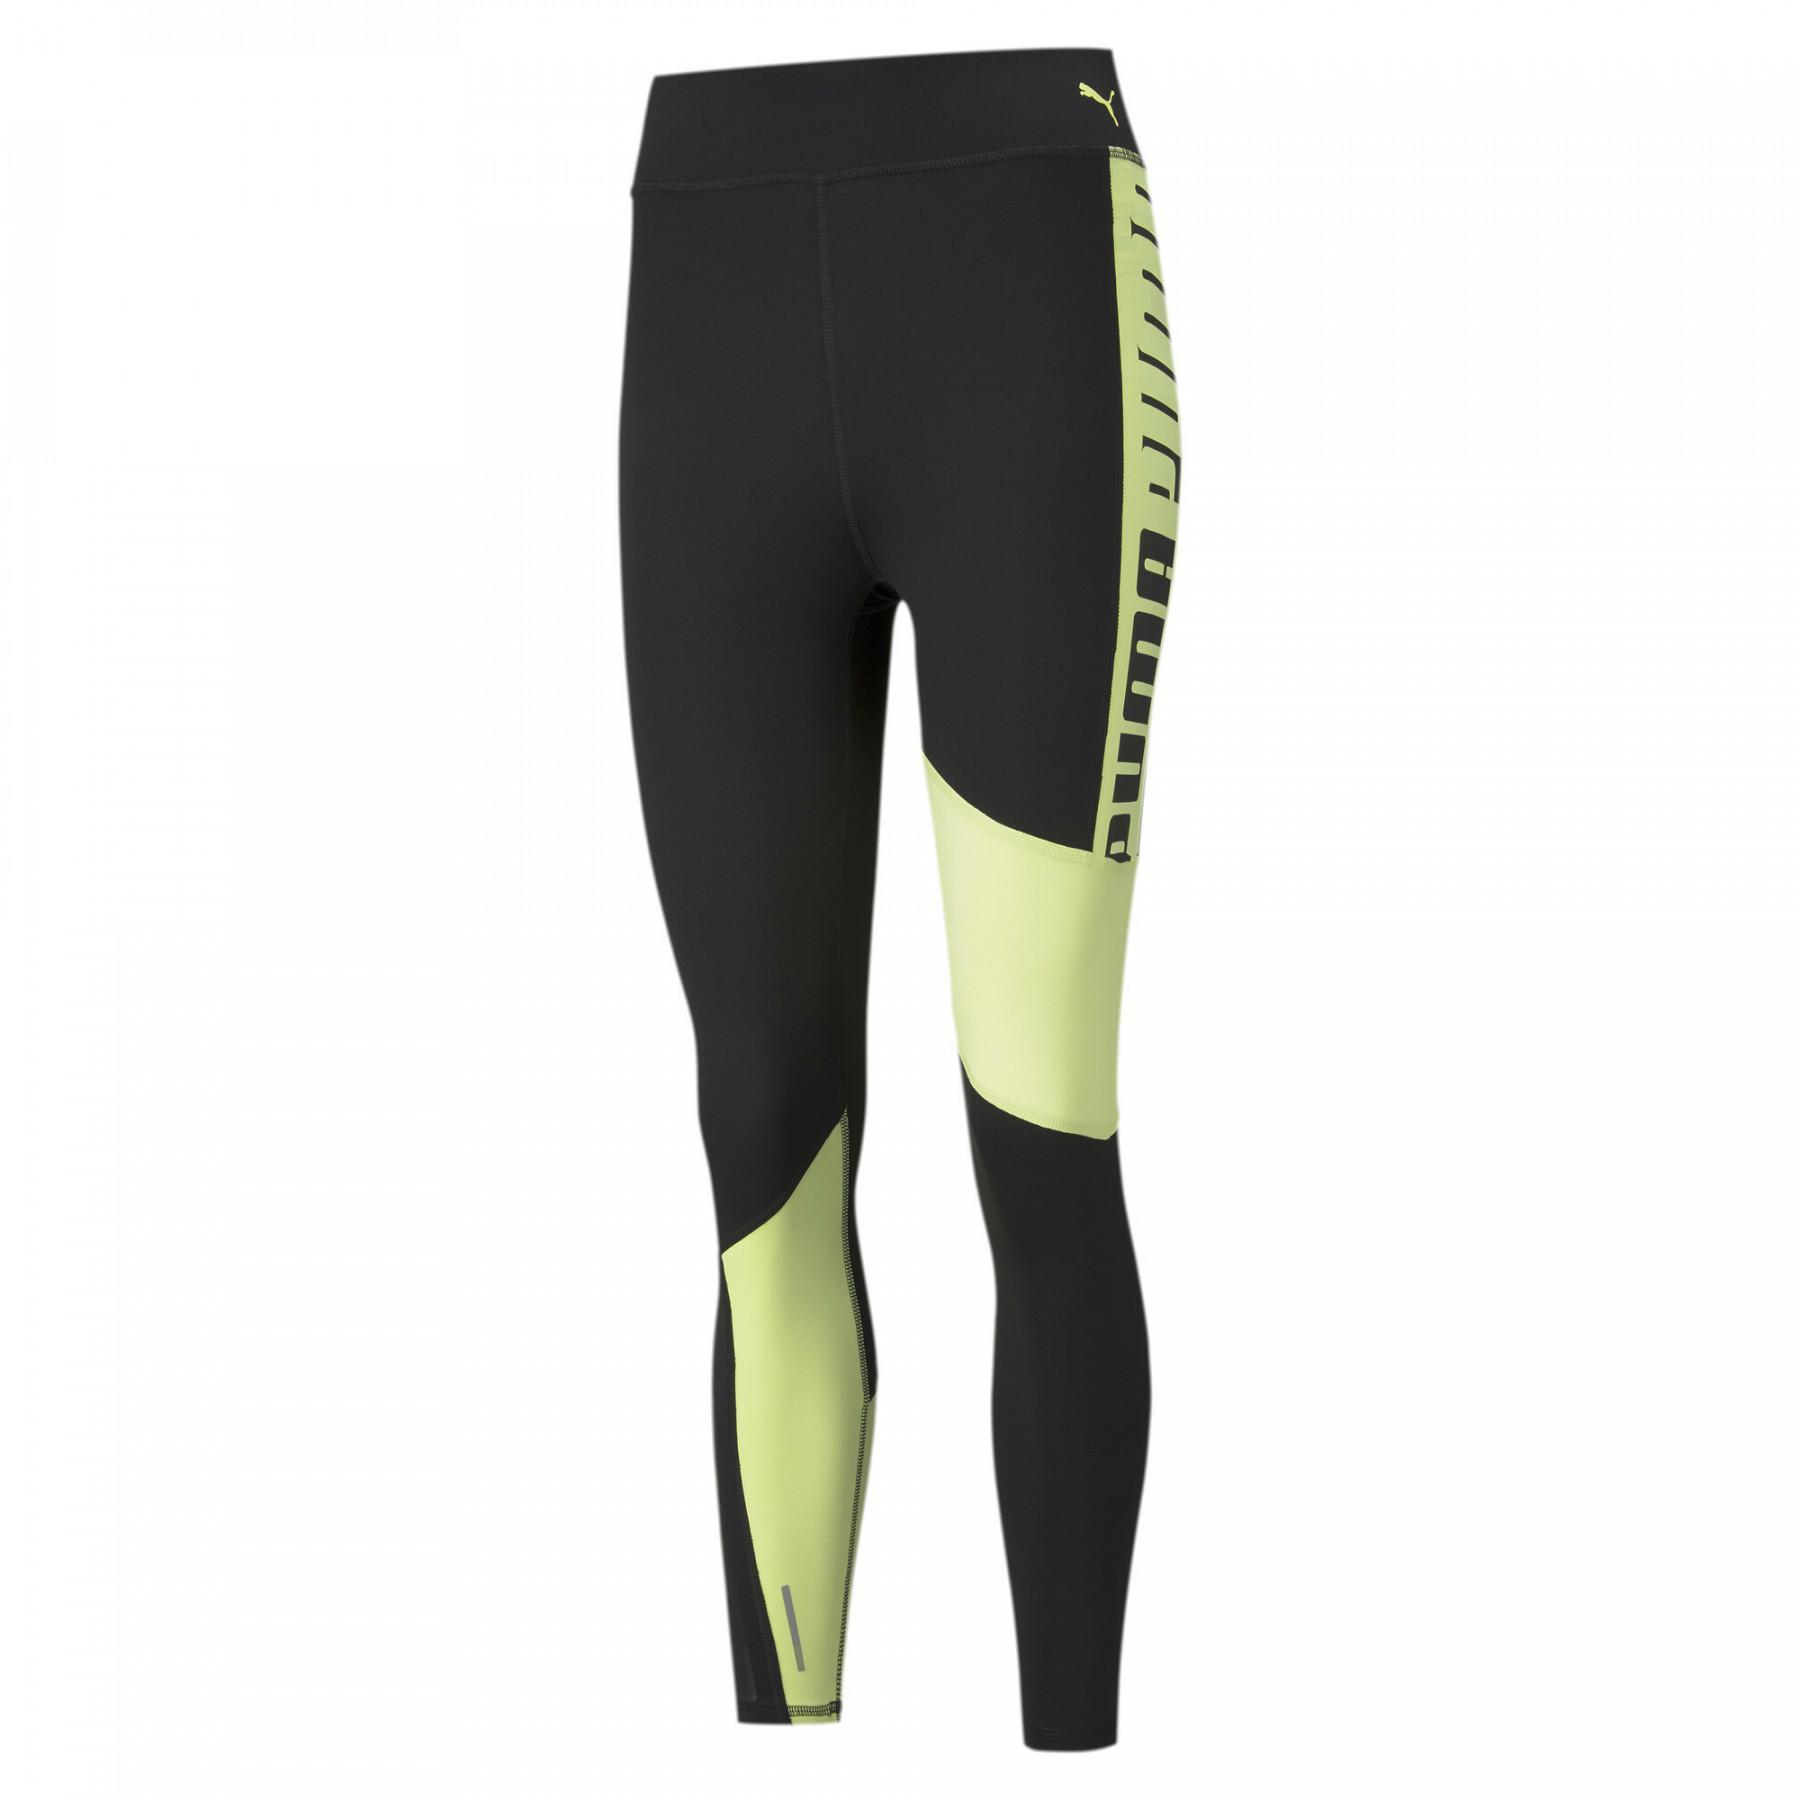 Women's high waist Puma Train Favorite Leggings Logo 7/8